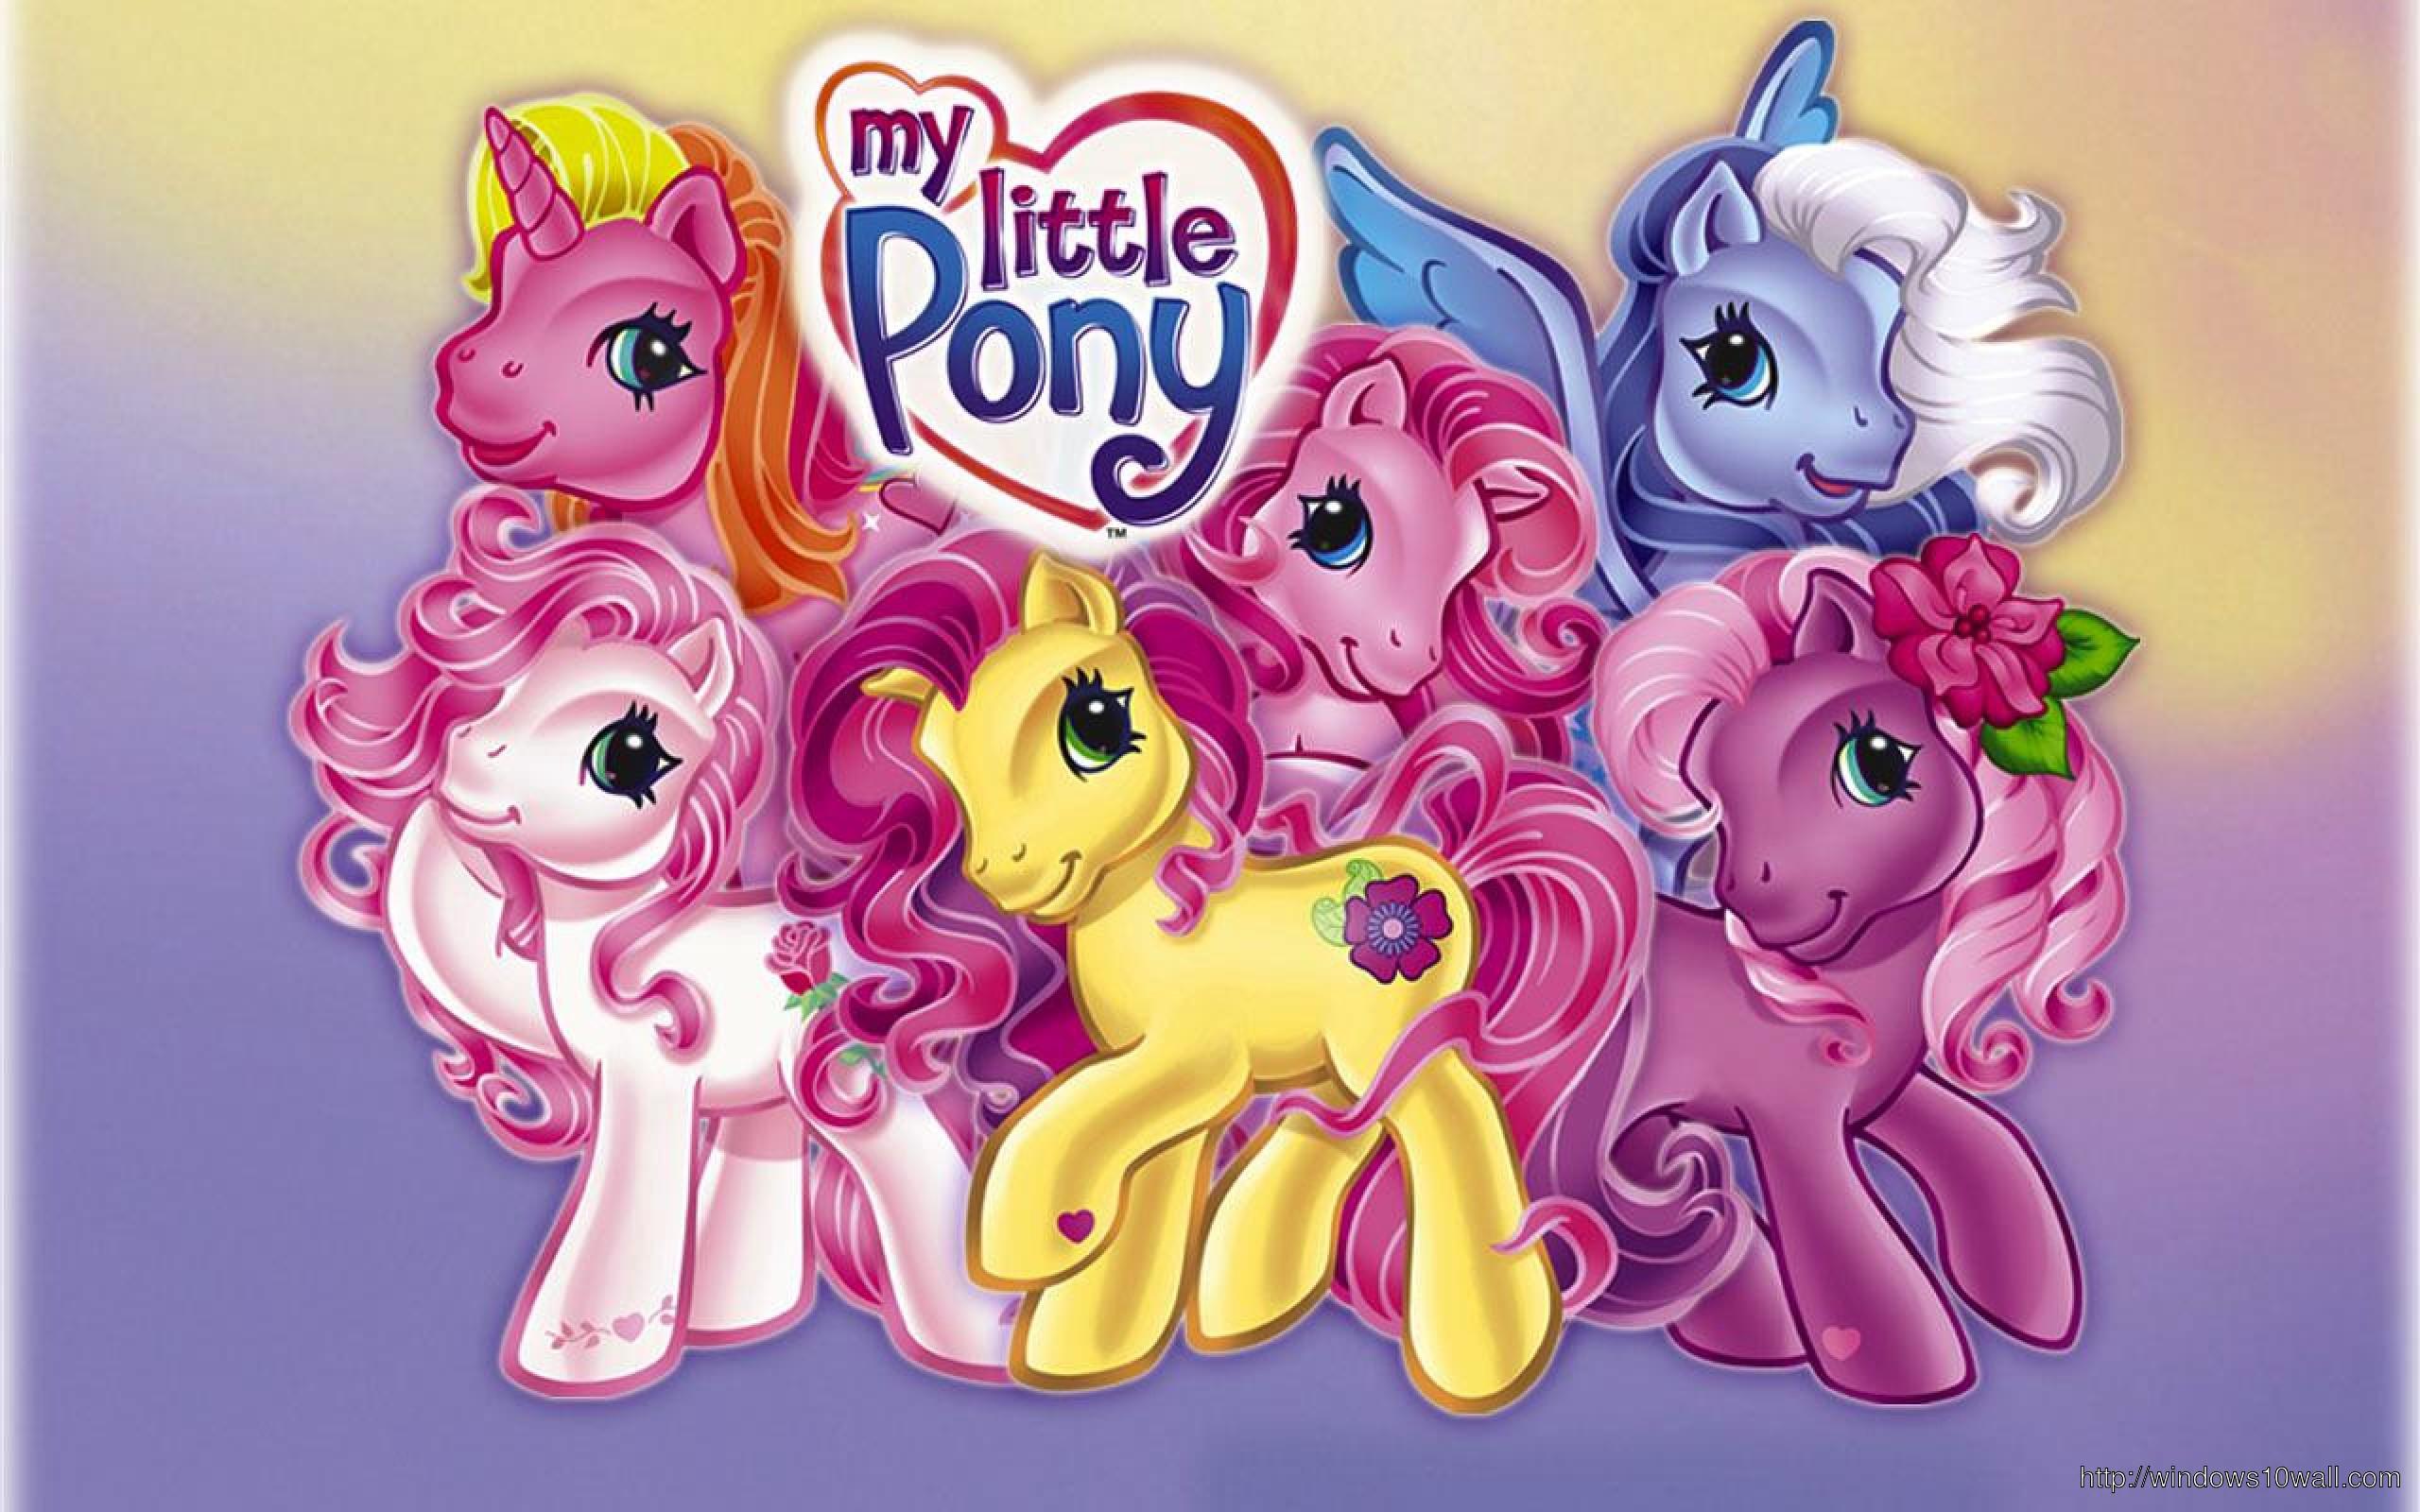 My-Little-Pony-Cute